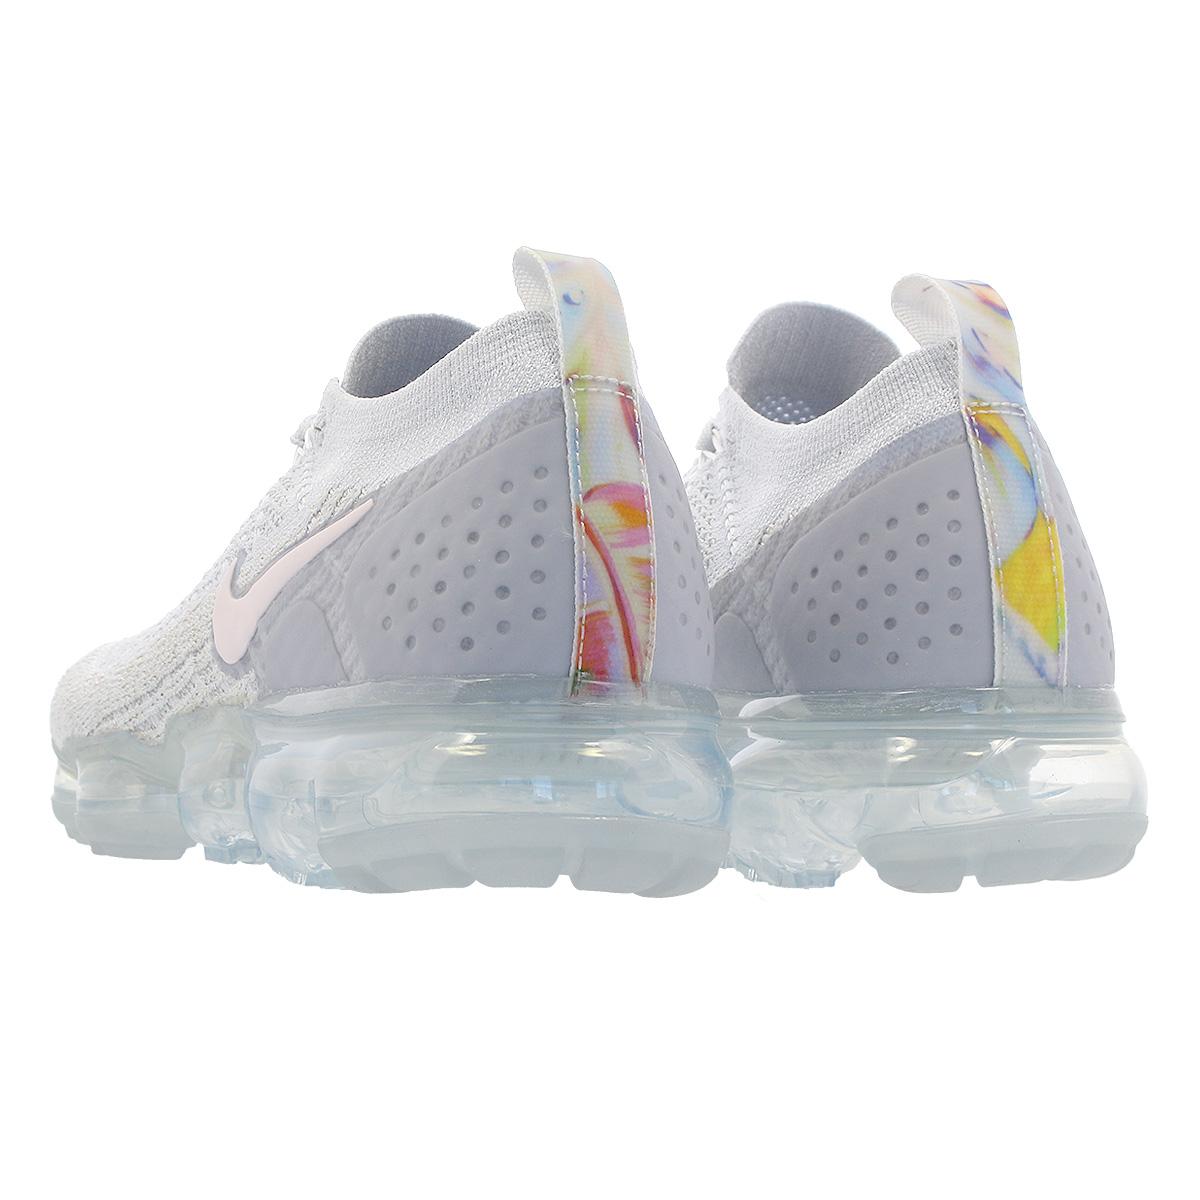 Nike W AIR Vapormax Flyknit 2 942843 011